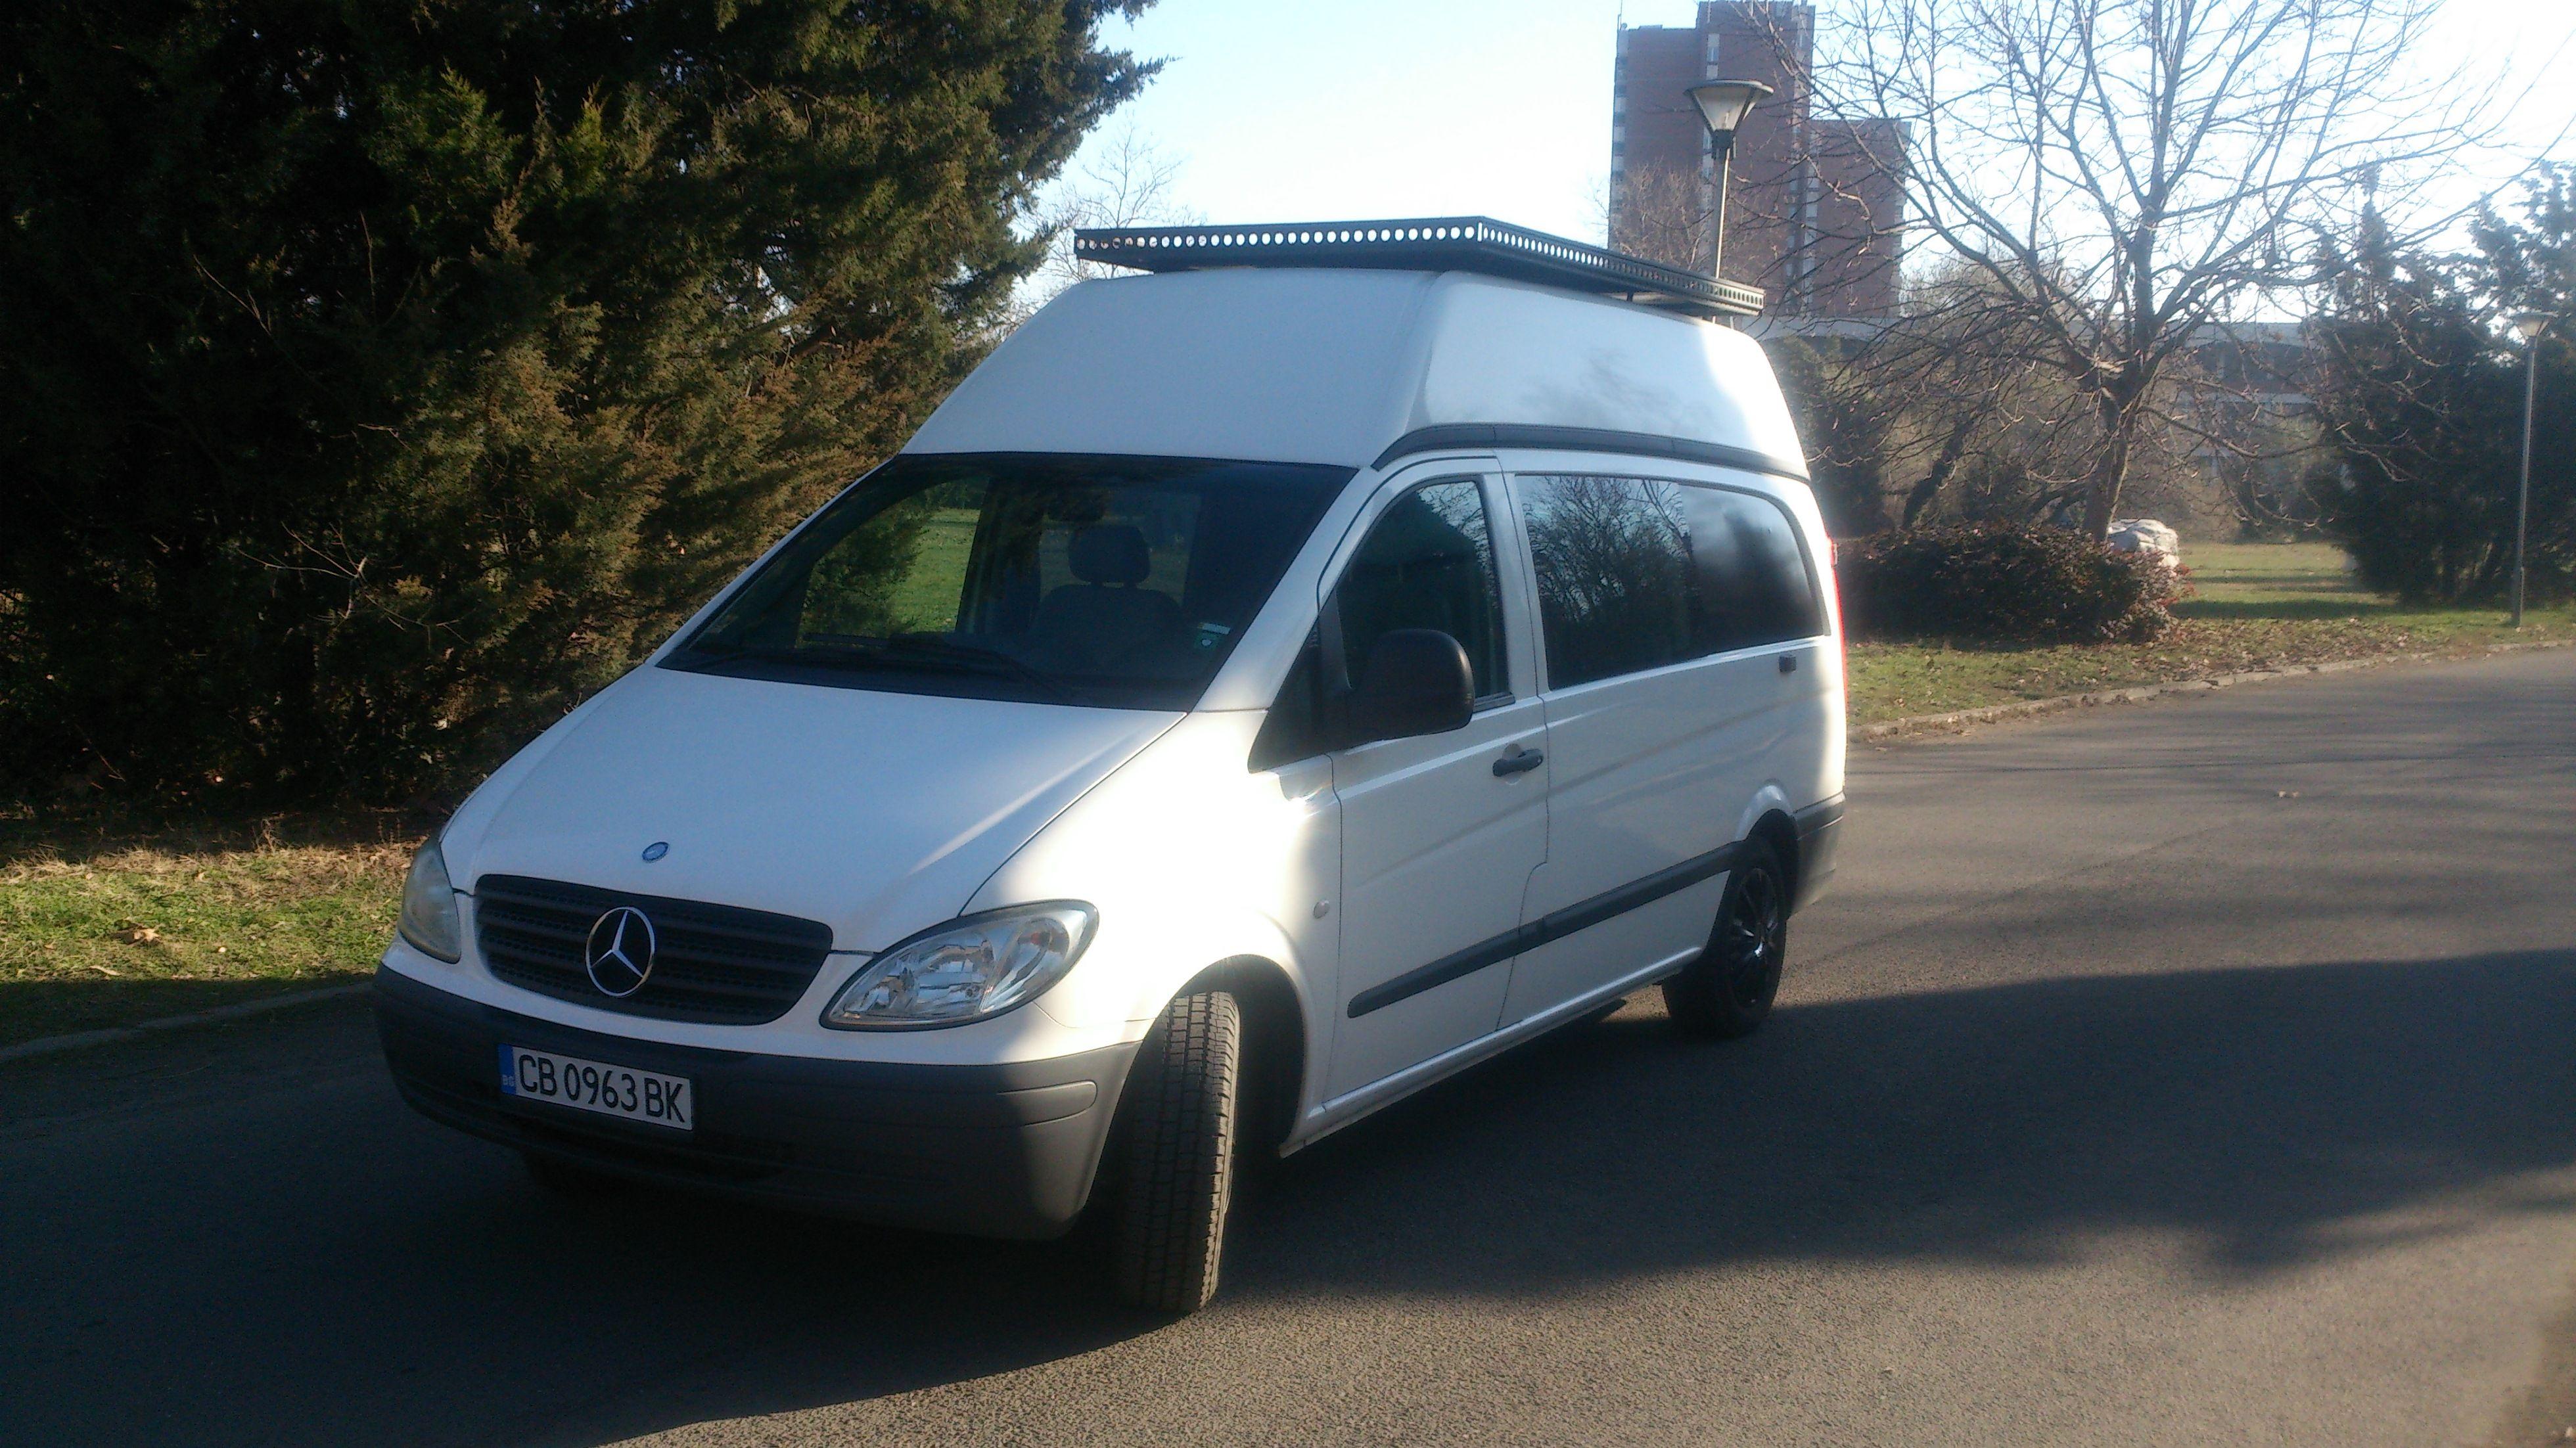 Producing Converting And Repairing Campers Caravans RV Mercedes Vito 2006 Camper Van